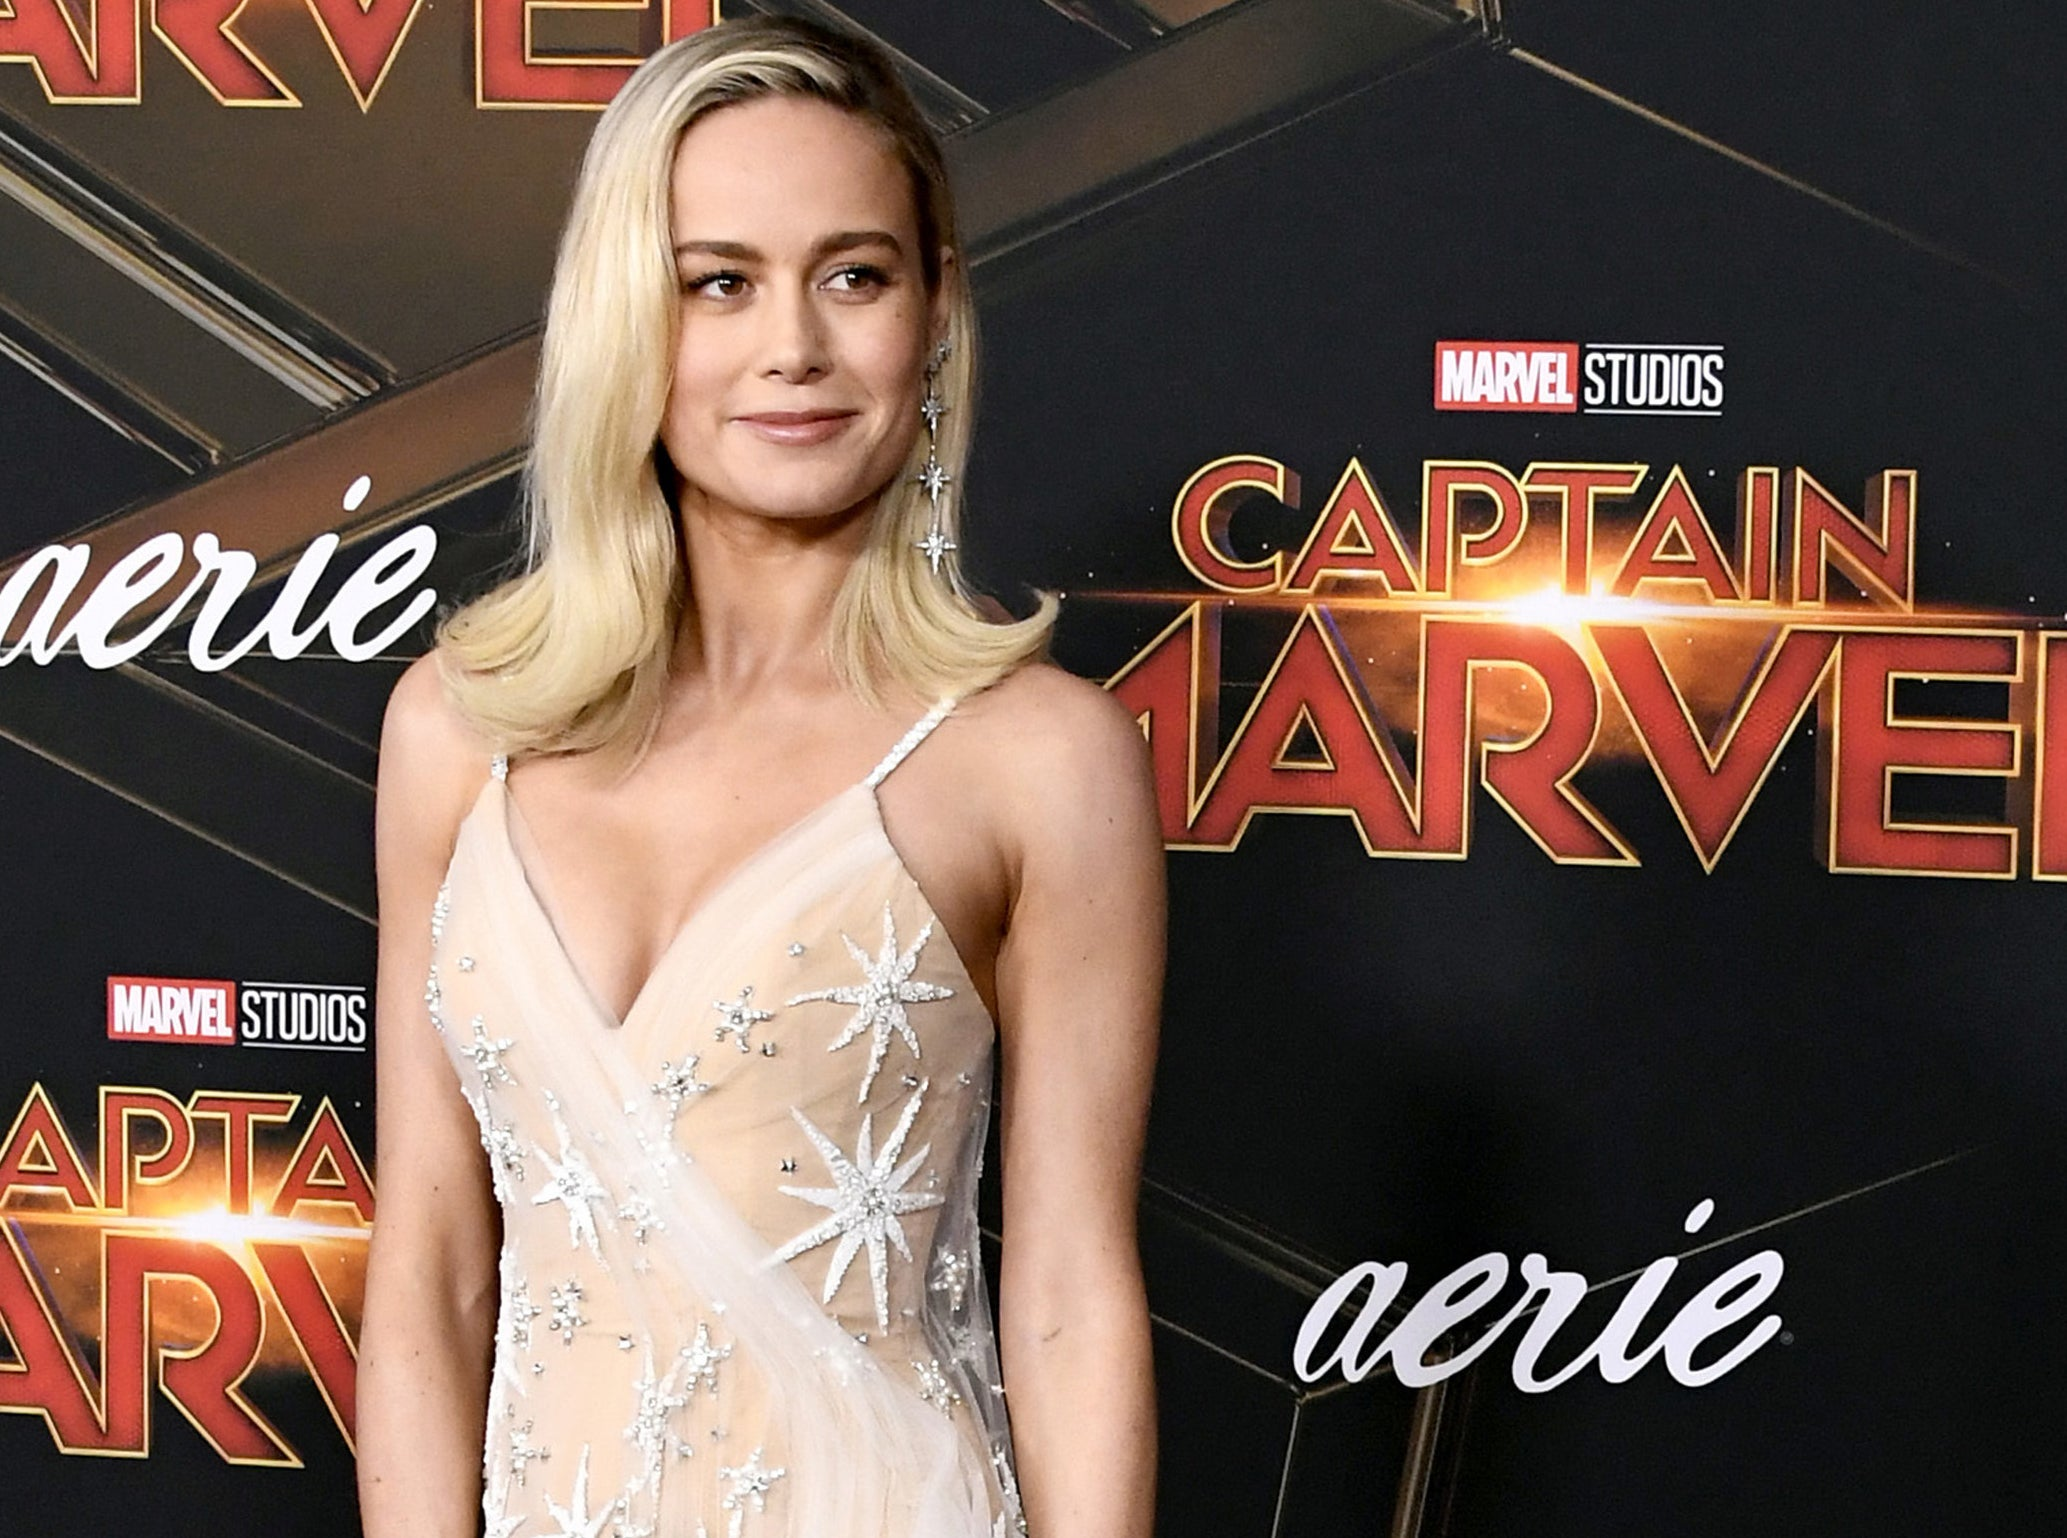 Brie attends the Captain Marvel premiere